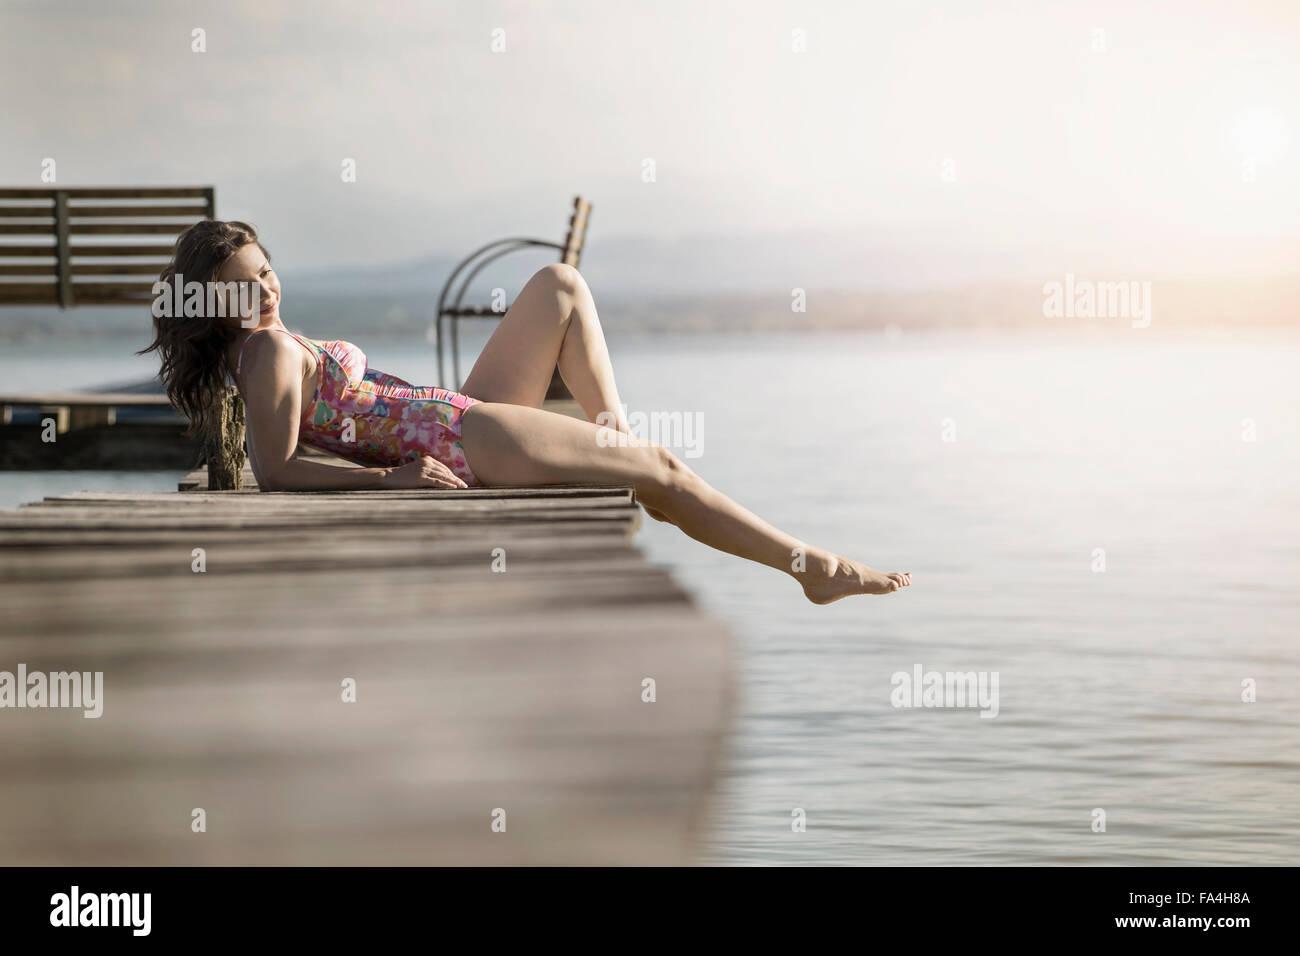 Reife Frau im Badeanzug am Pier, Bayern, Deutschland Stockbild